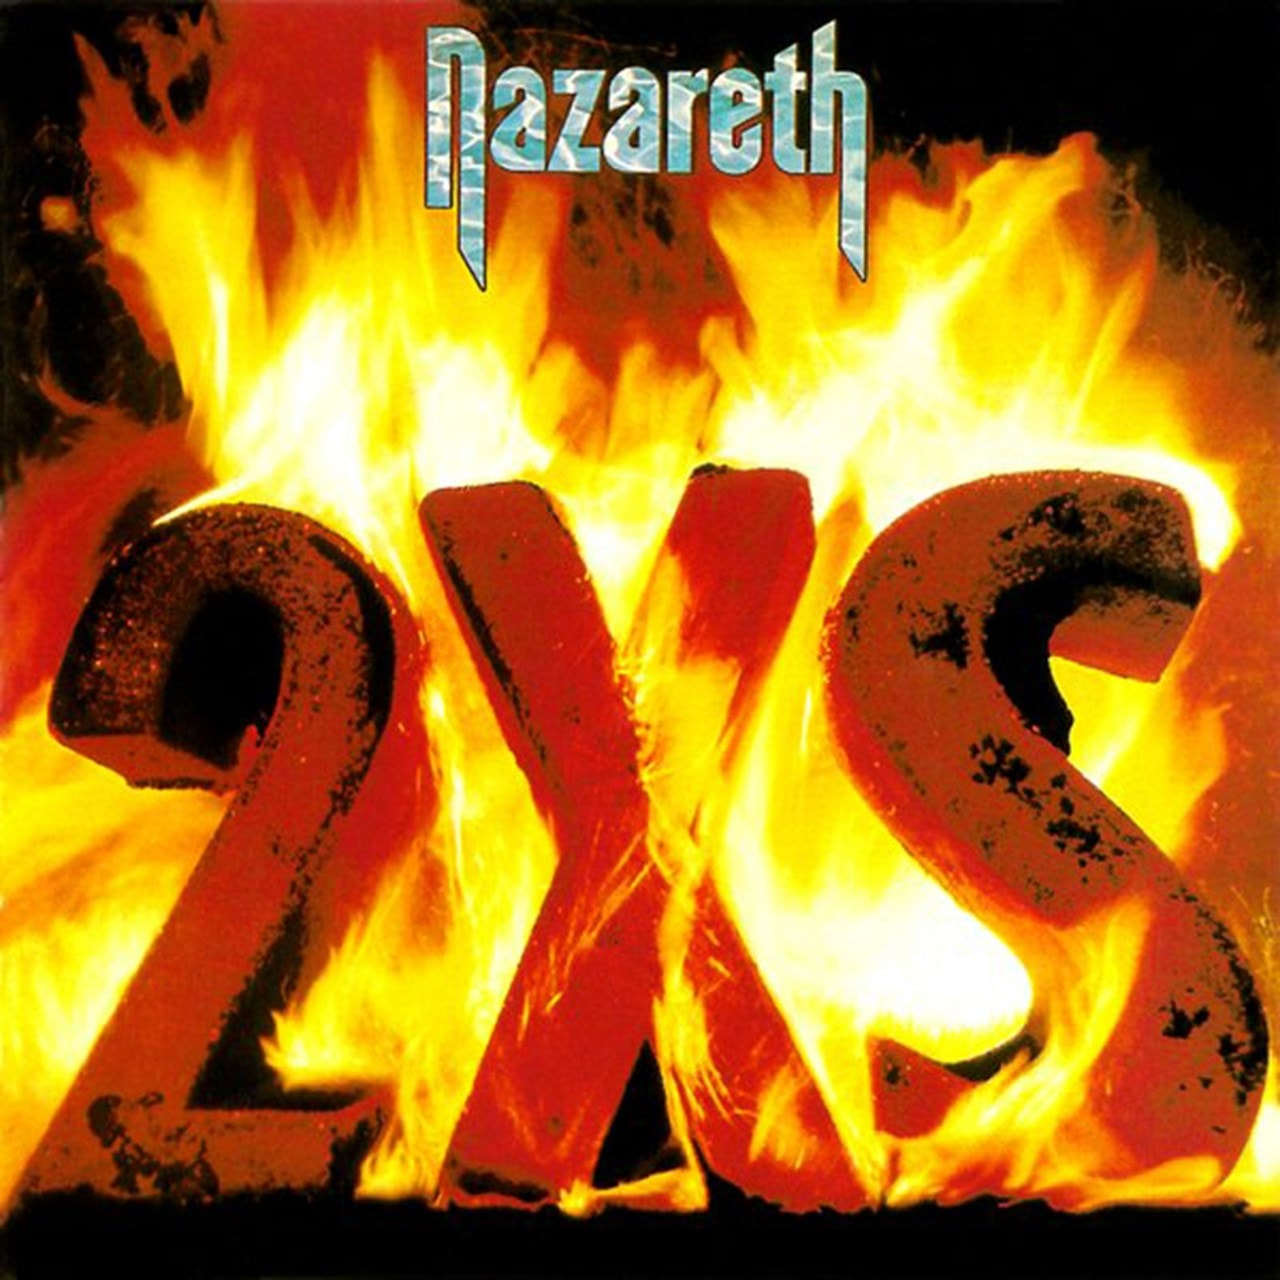 2XS - 1